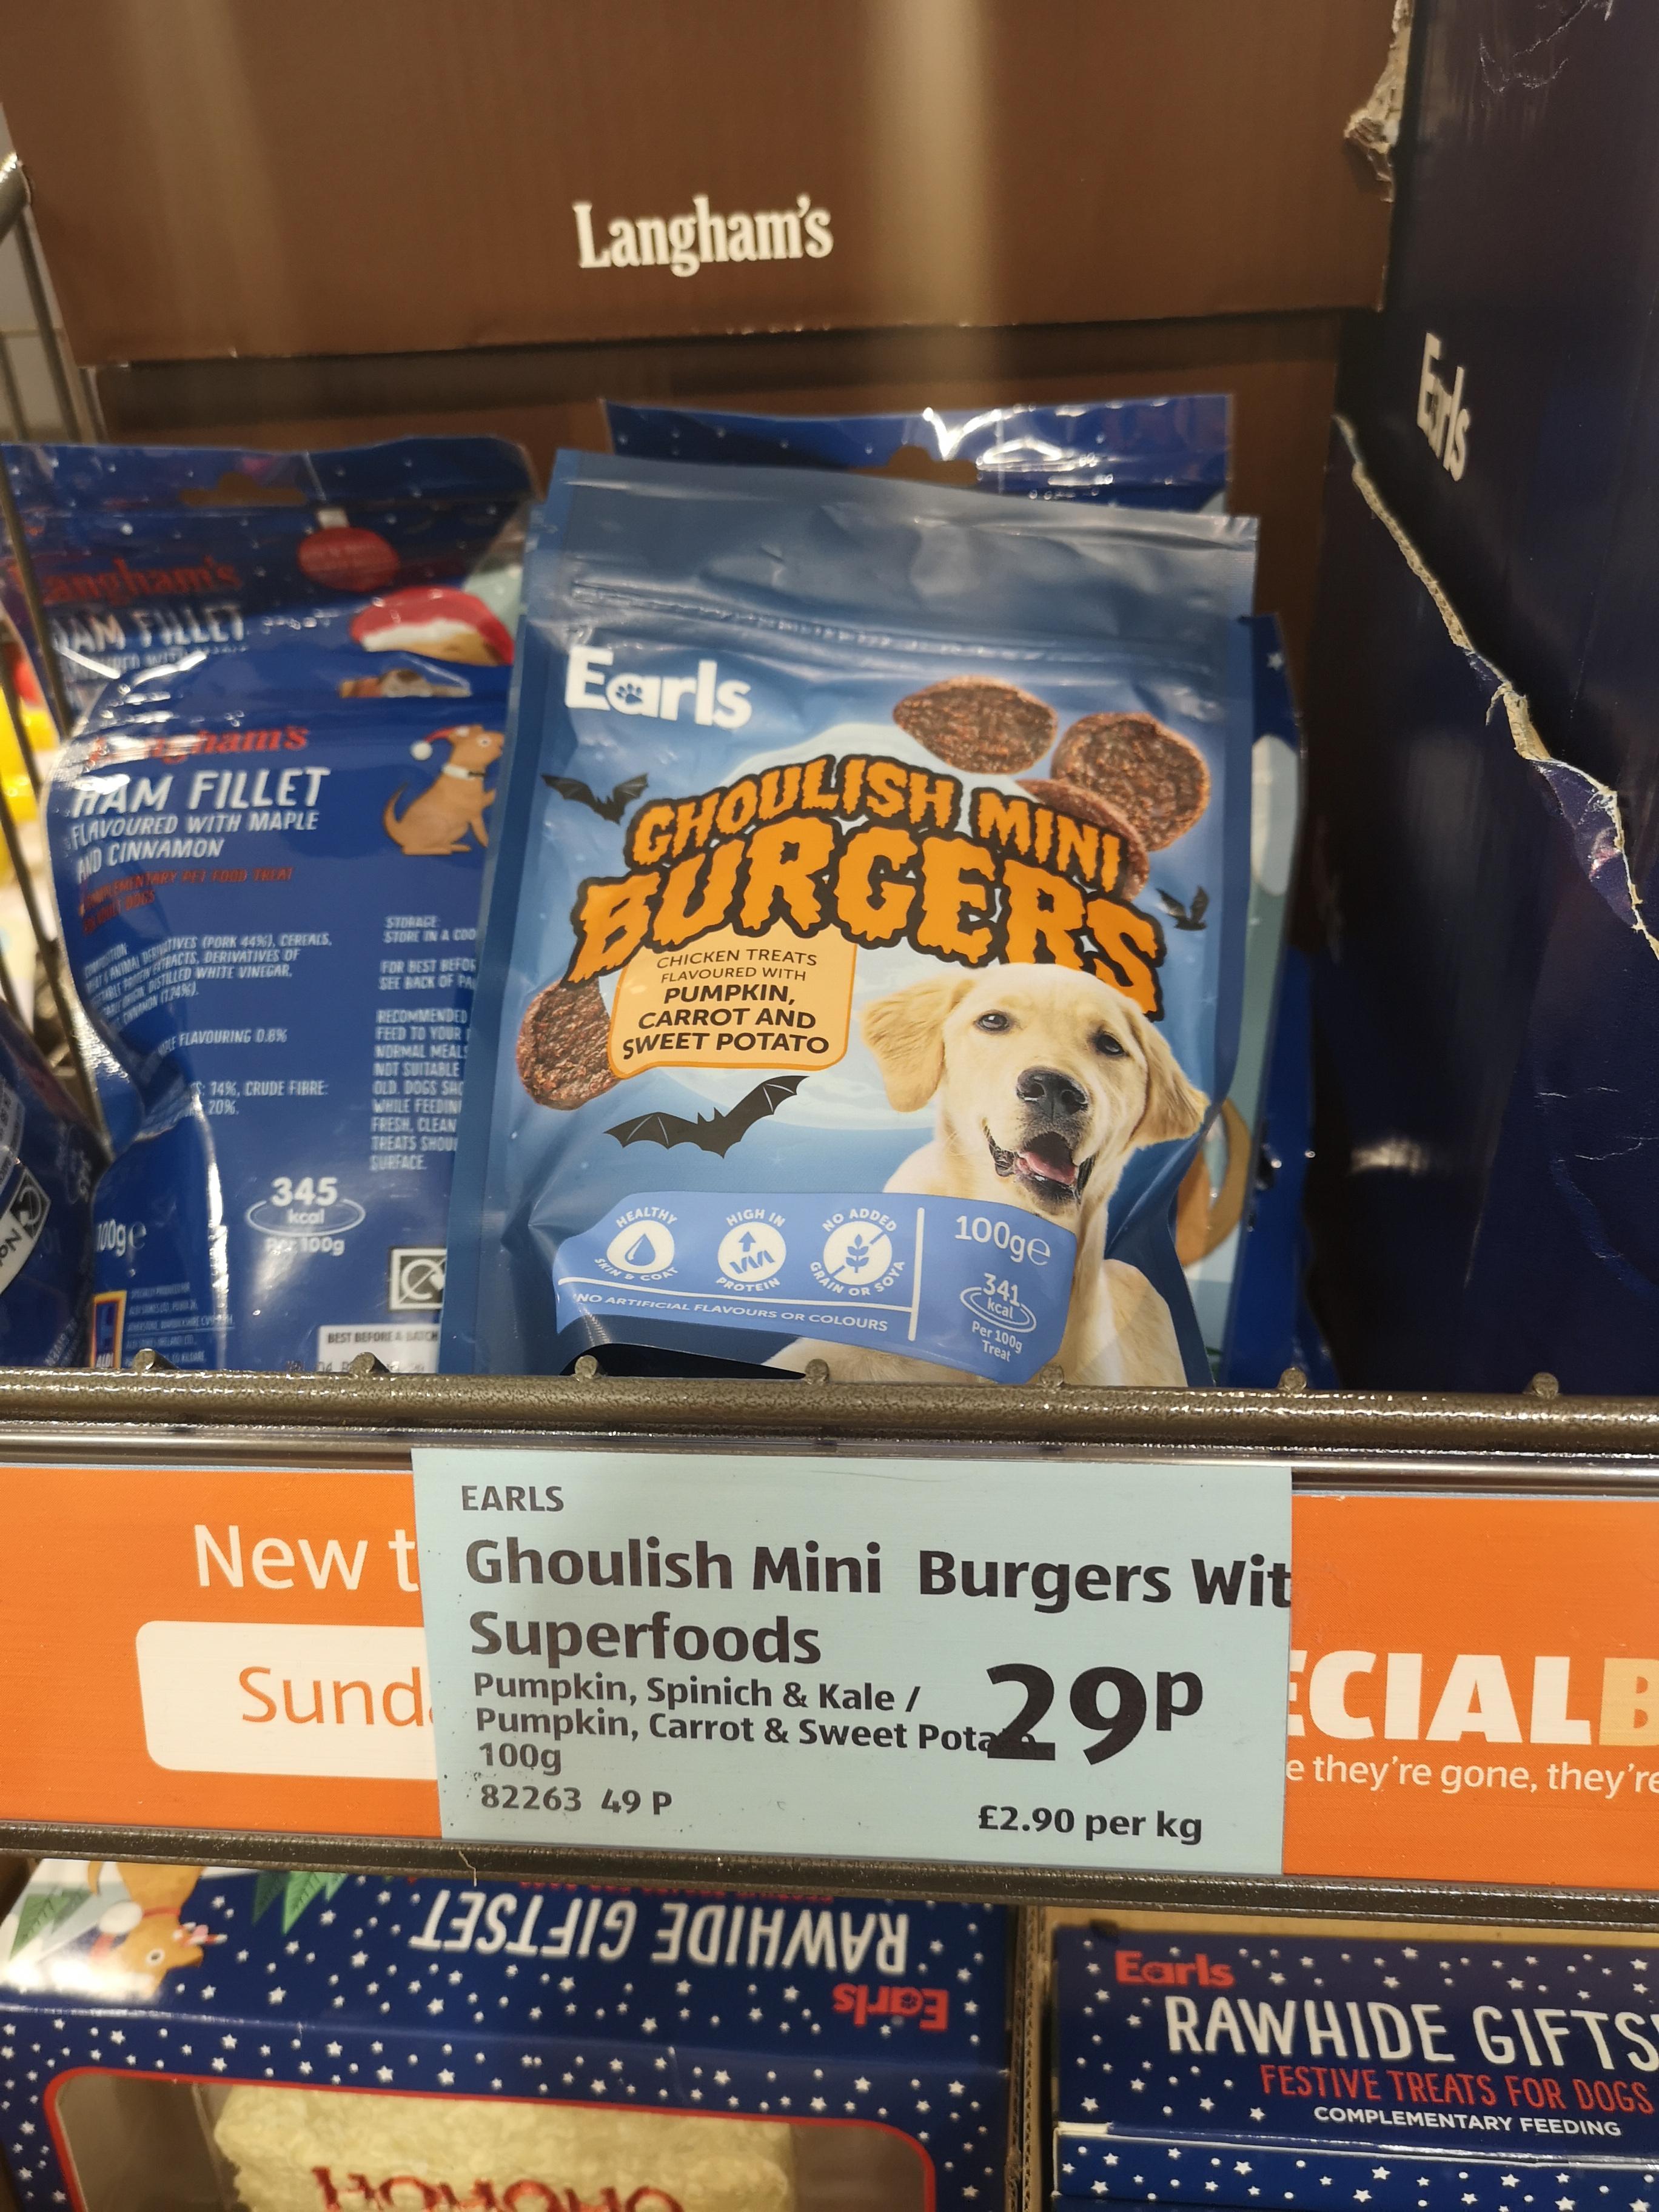 Earls Ghoulish mini burgers with superfoods Aldi Dog Treats